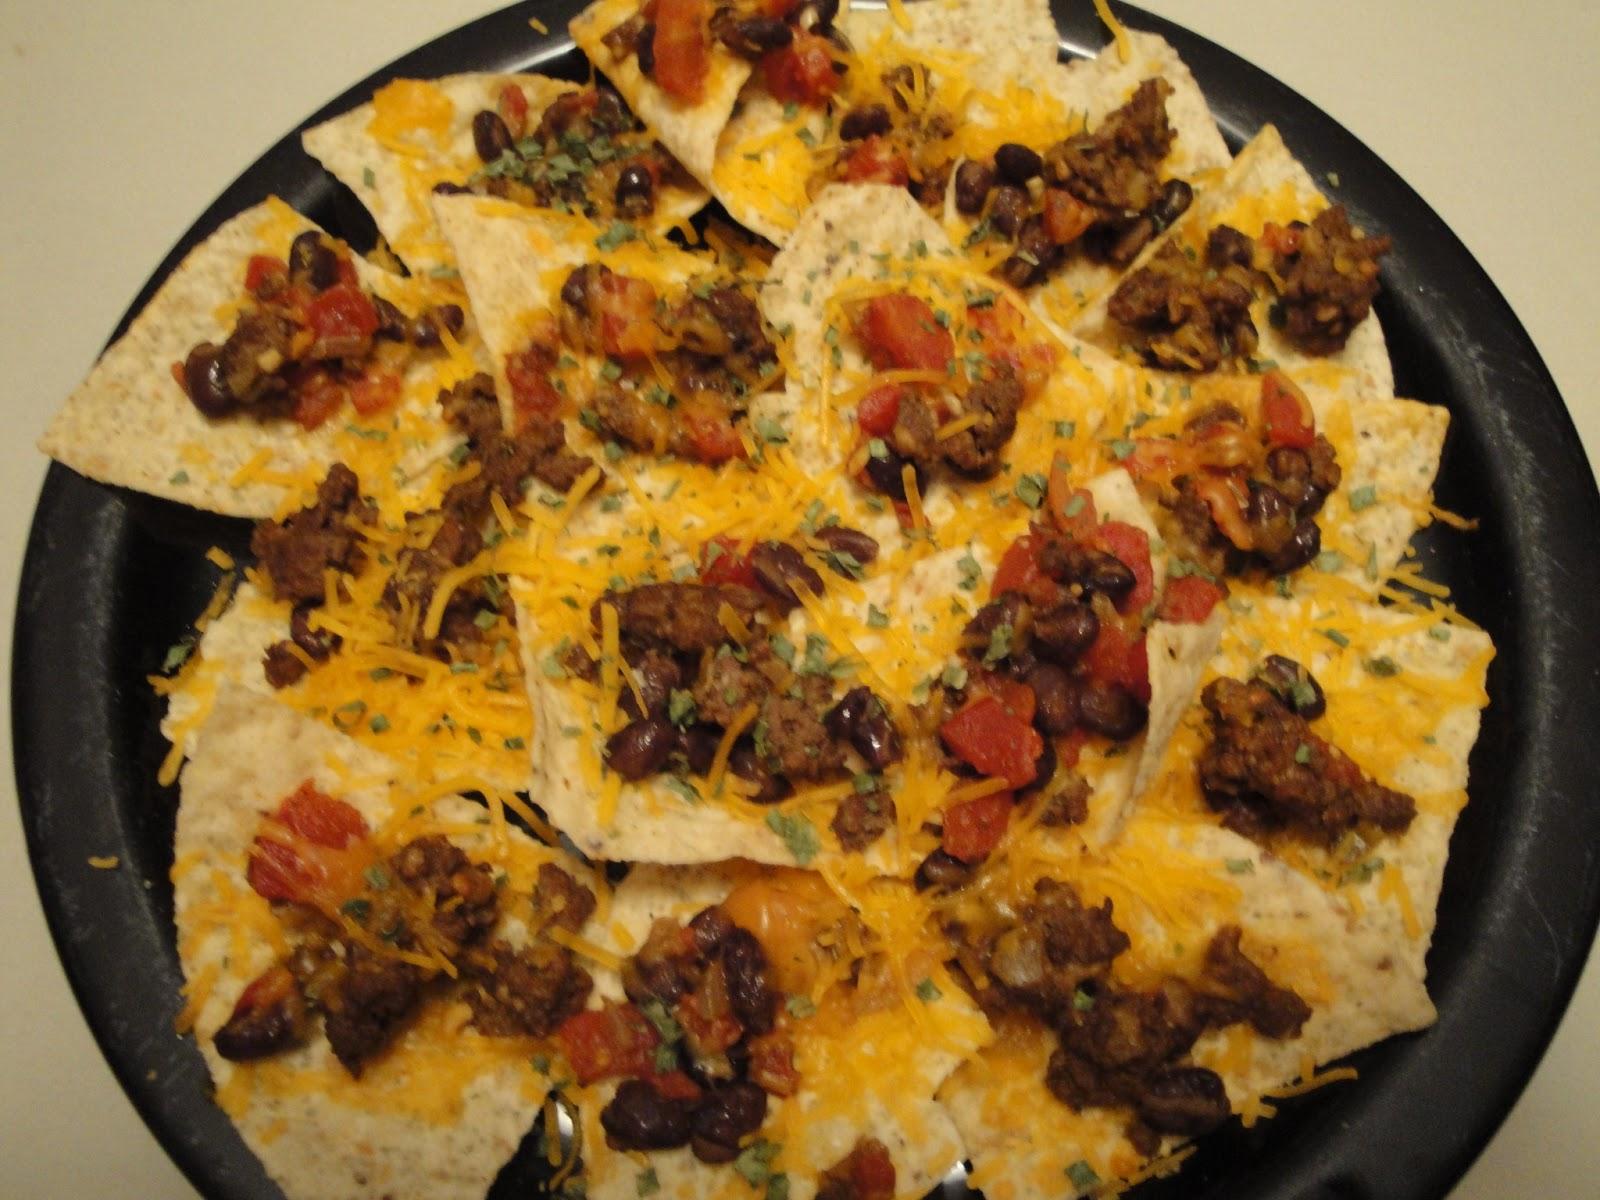 ... nachos caribbean nachos breakfast nachos shrimp nachos nachos fabuloso